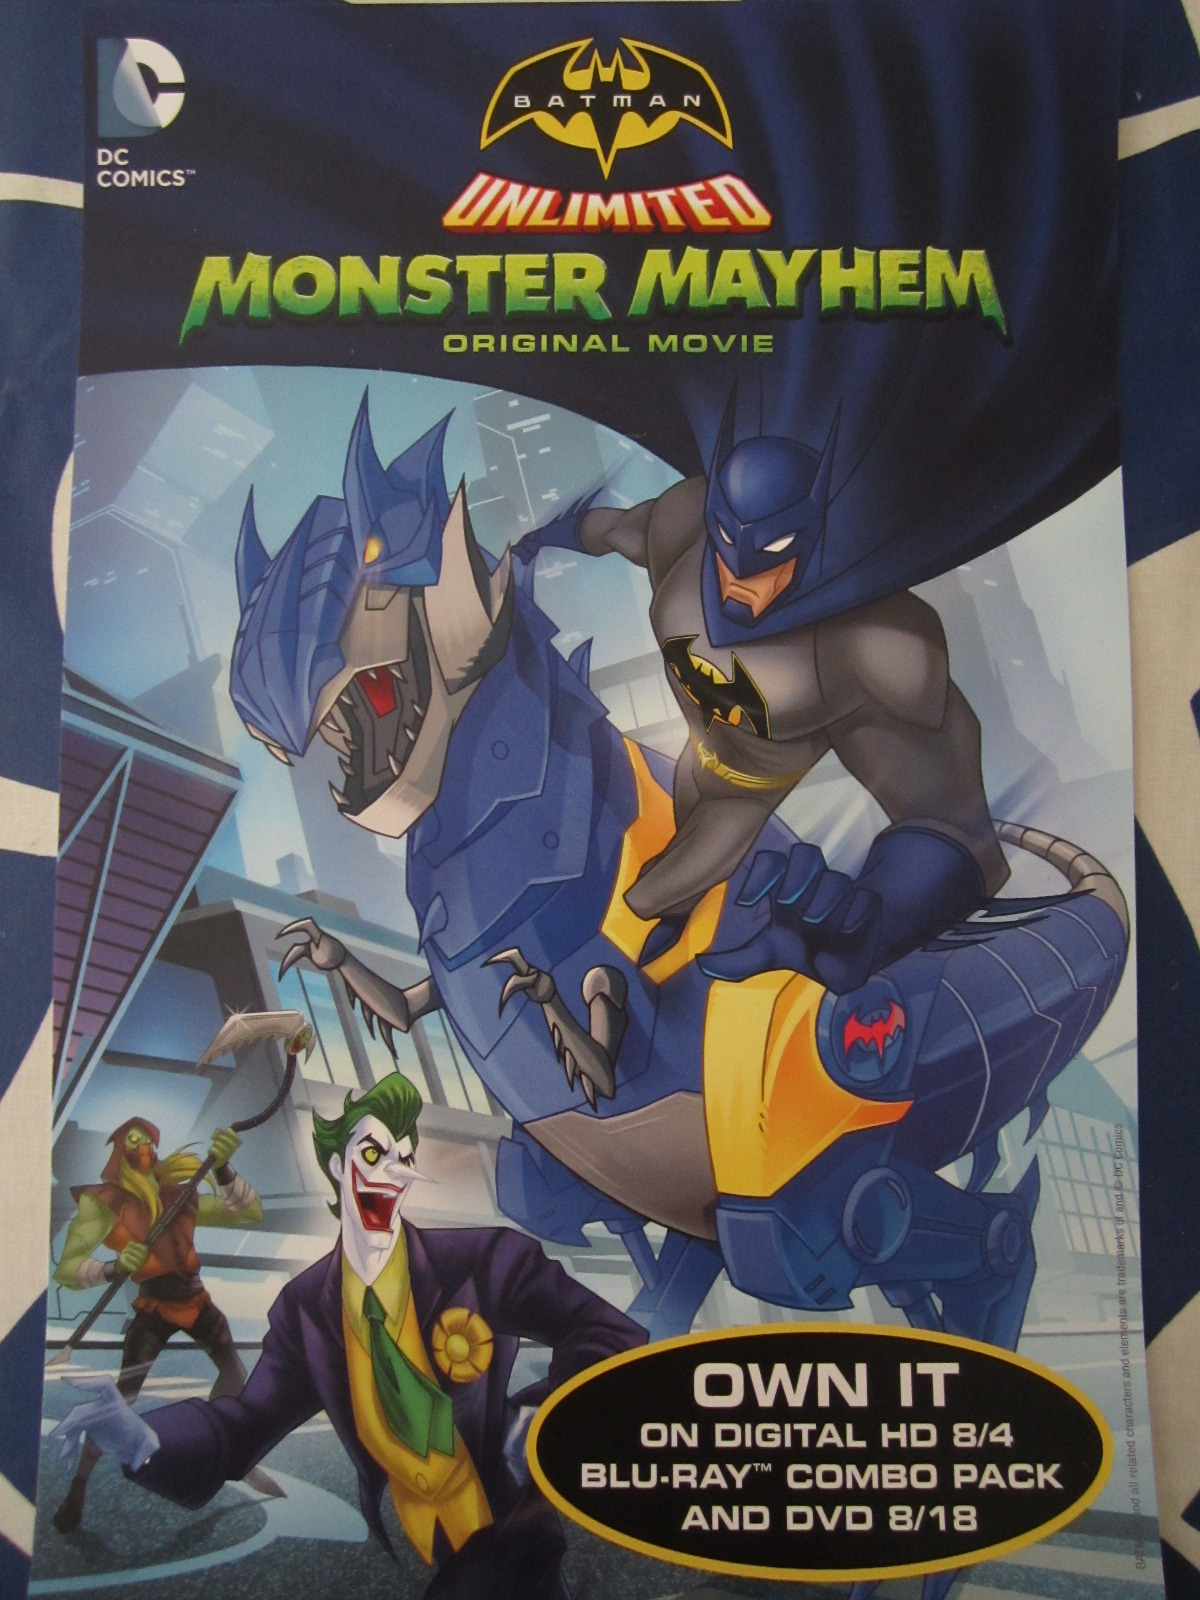 High Resolution Wallpaper | Batman Unlimited: Monster Mayhem 1200x1600 px